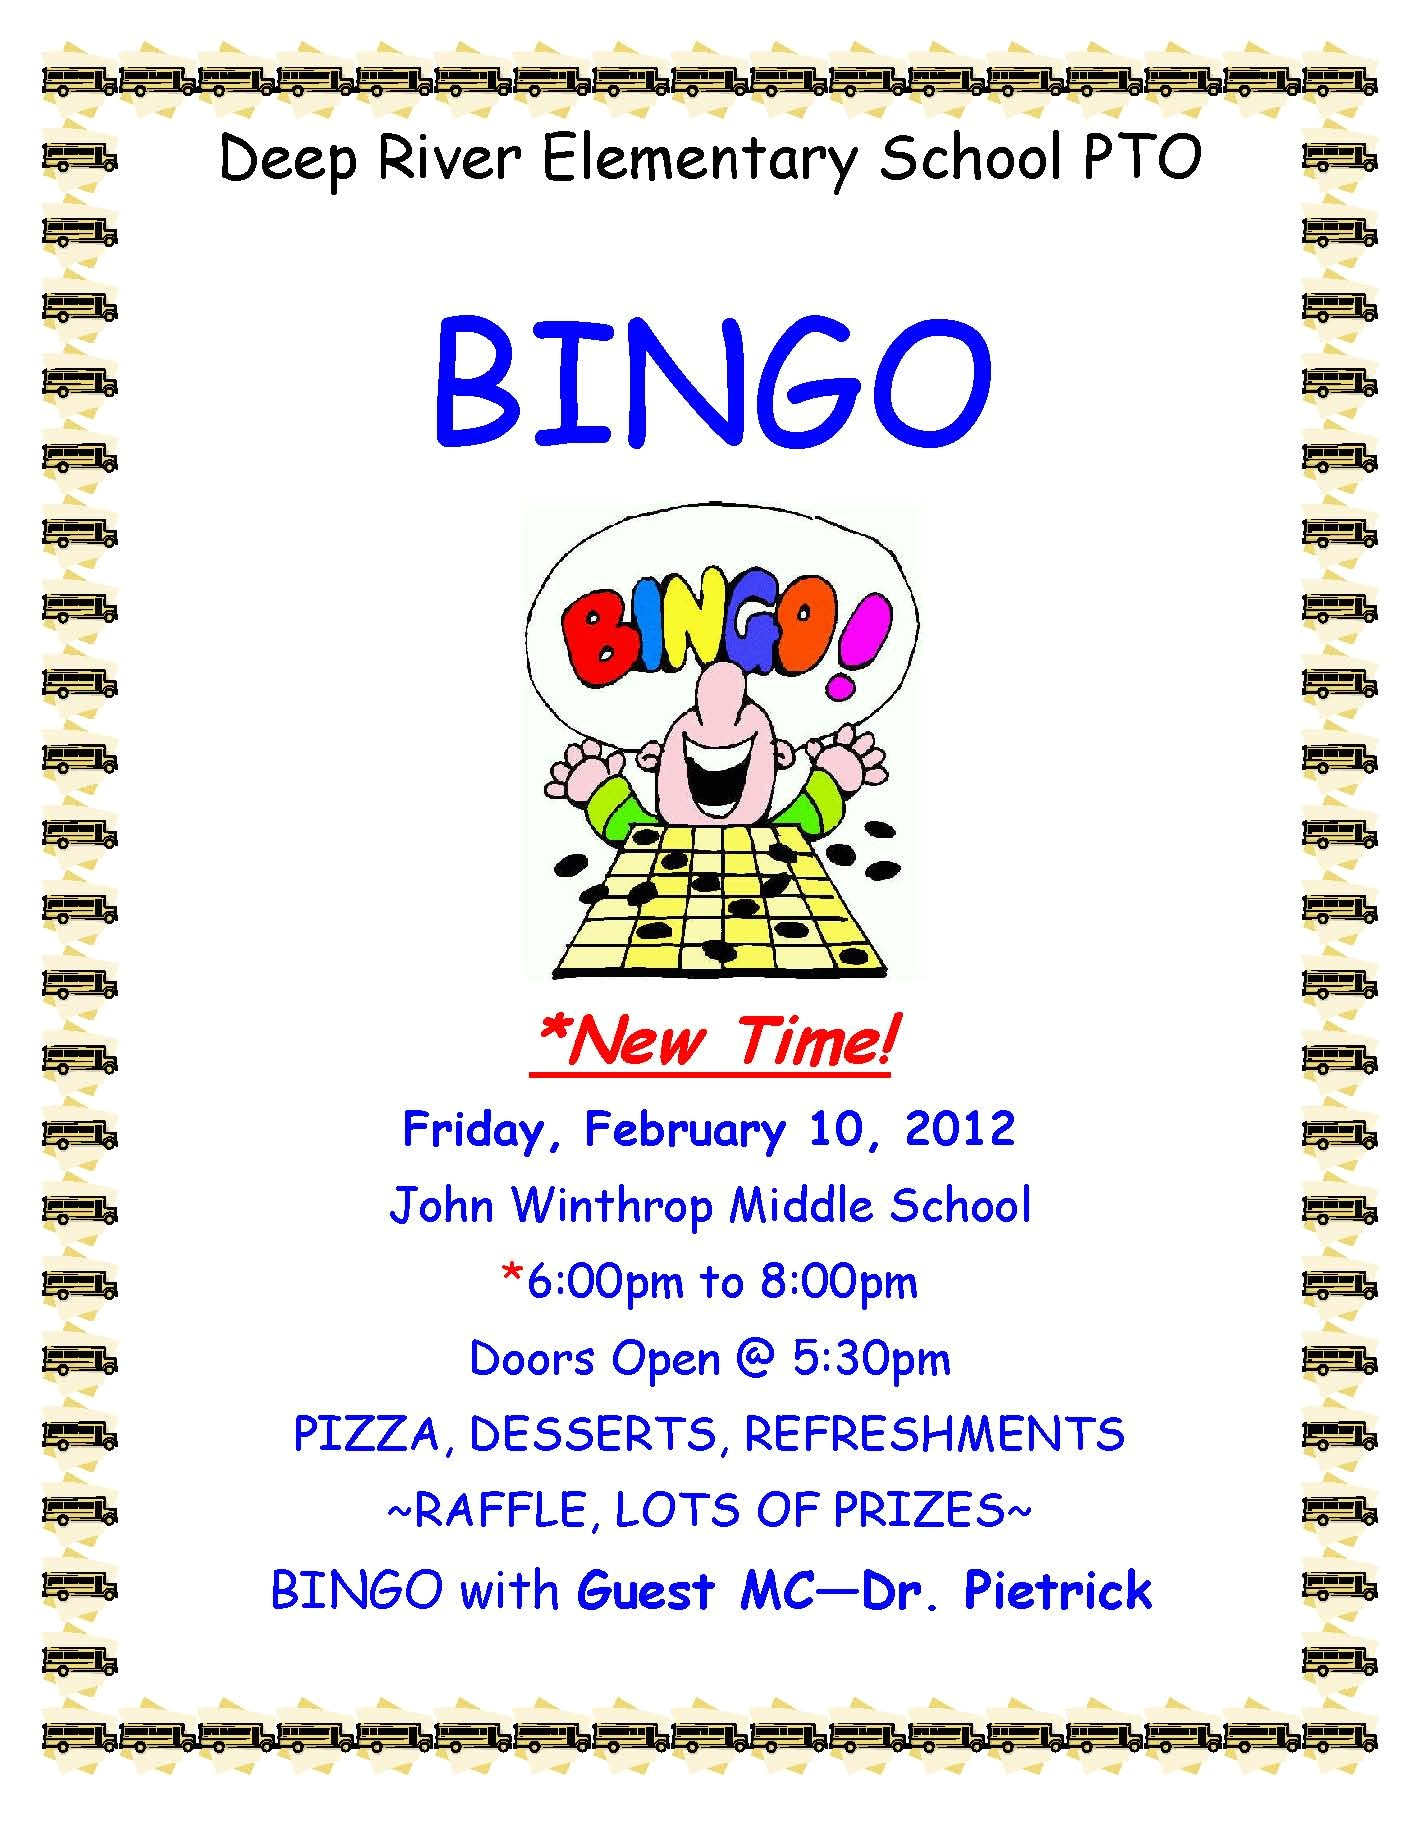 bingo flyers bingo flyer templates and printing party invitations lZ72rY clipart